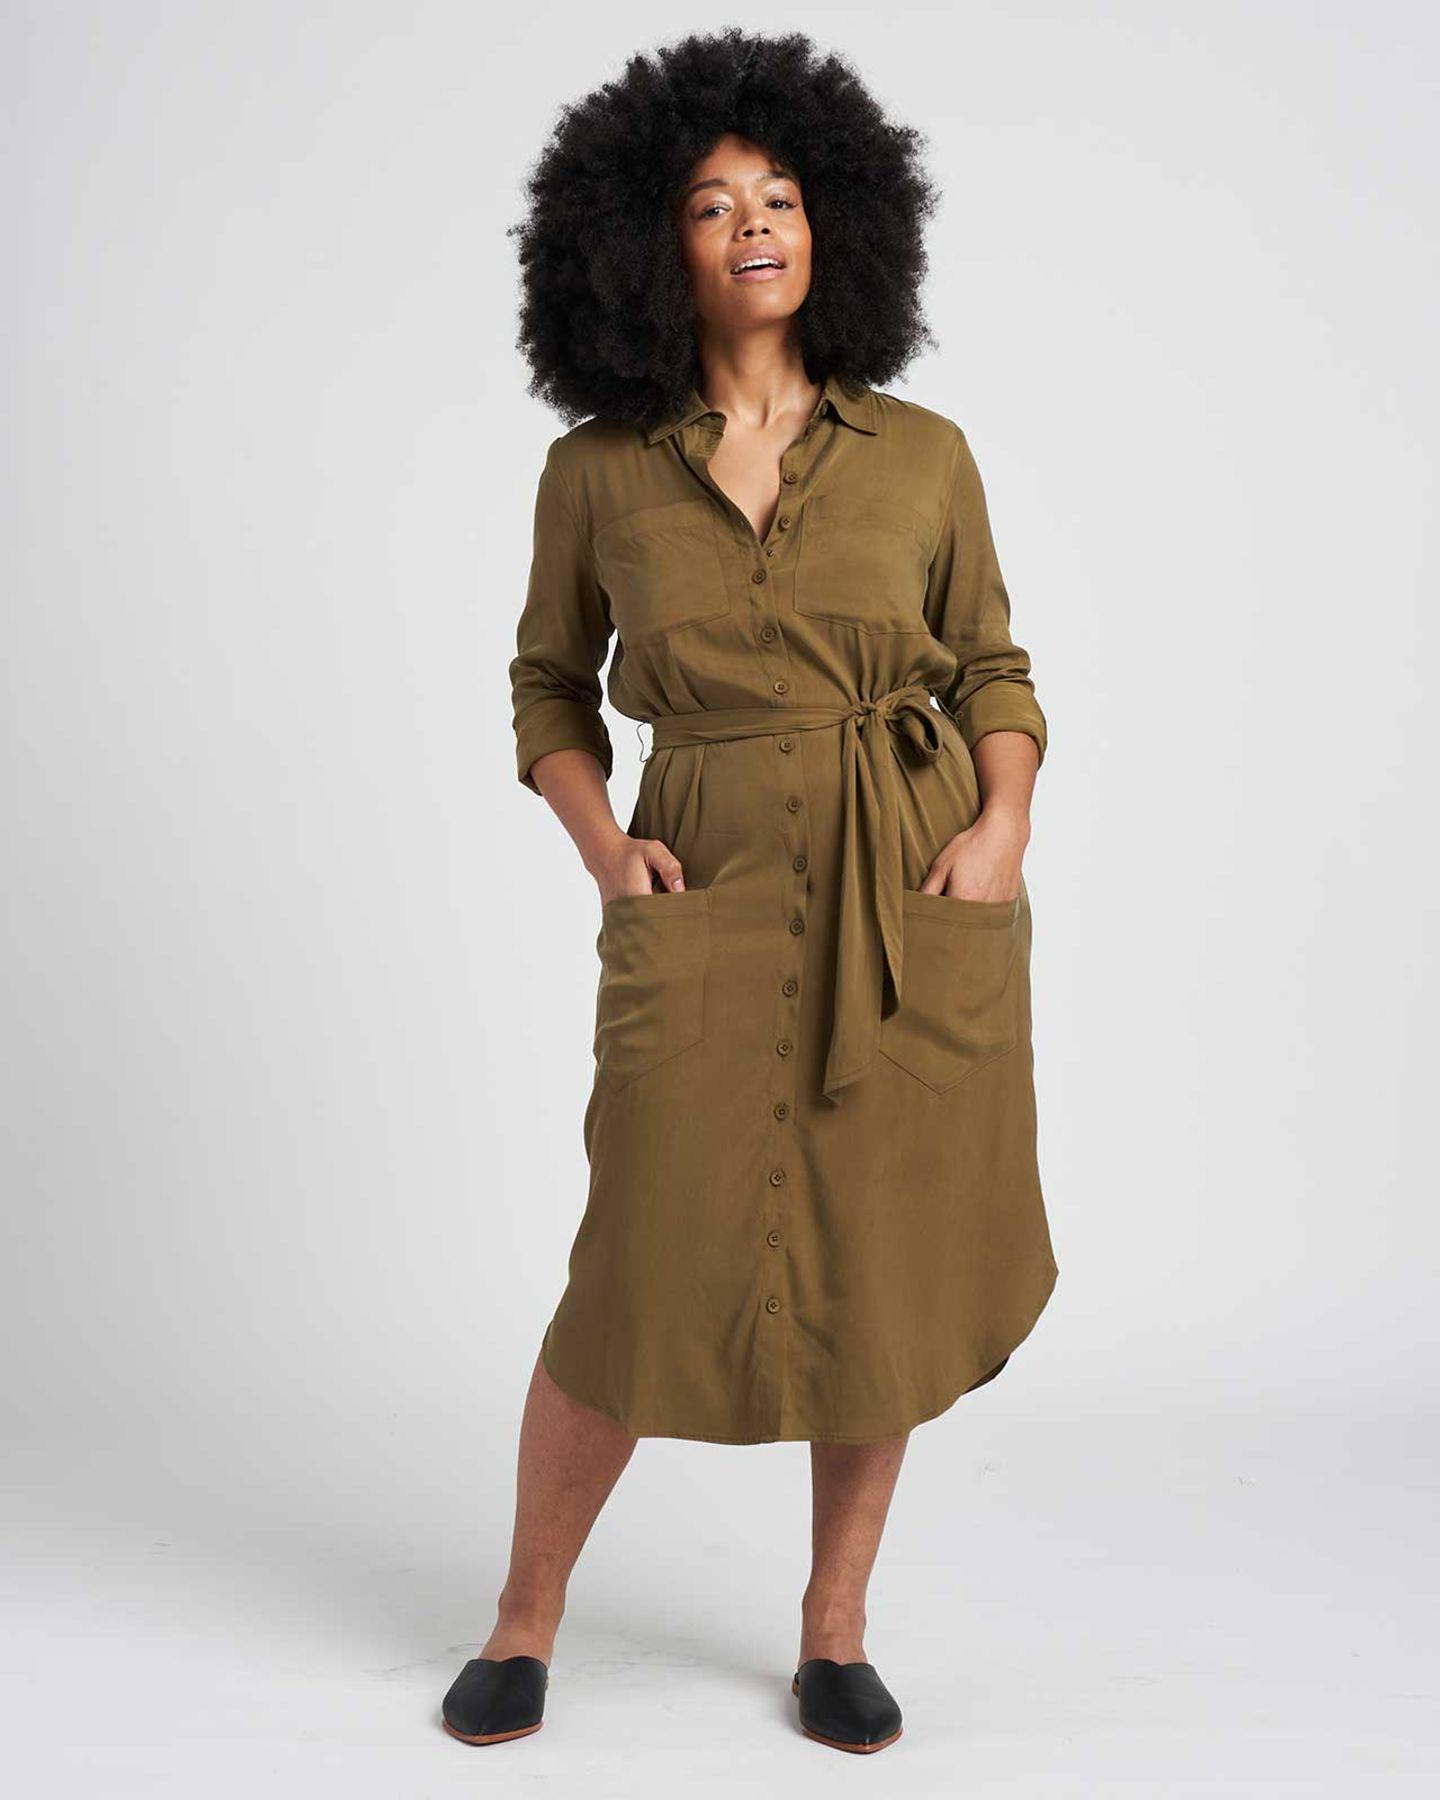 Michelle Cupro Shirt Dress - Olive - image 1